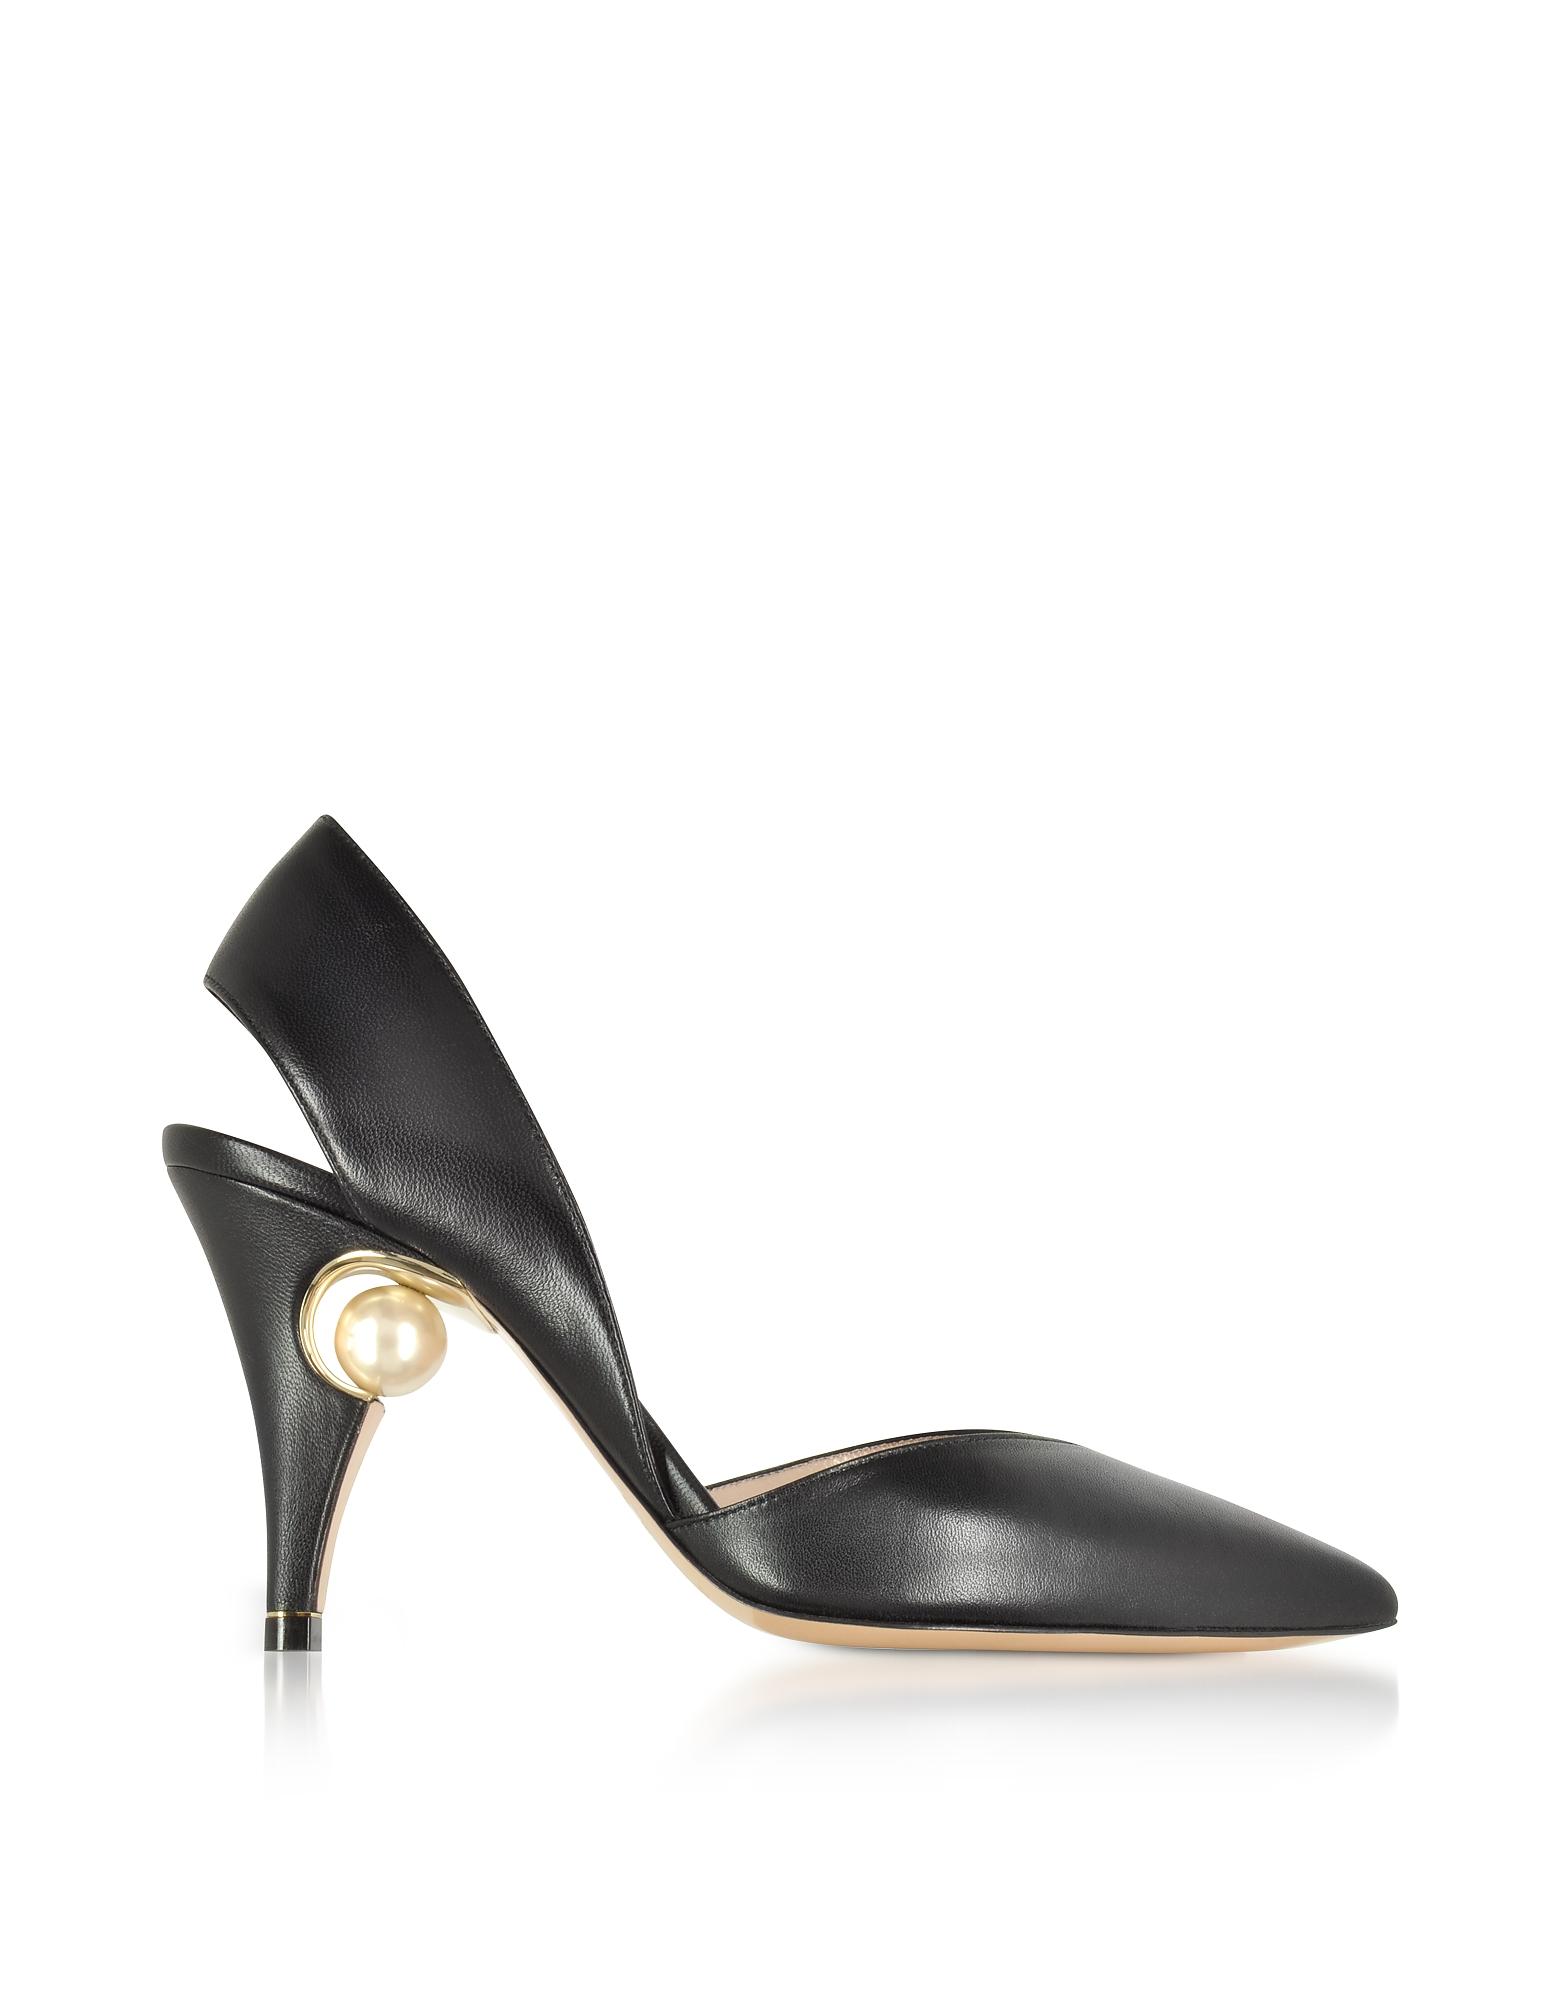 Nicholas Kirkwood Shoes, Penelope Pearl Black Nappa Leather Sling Pump